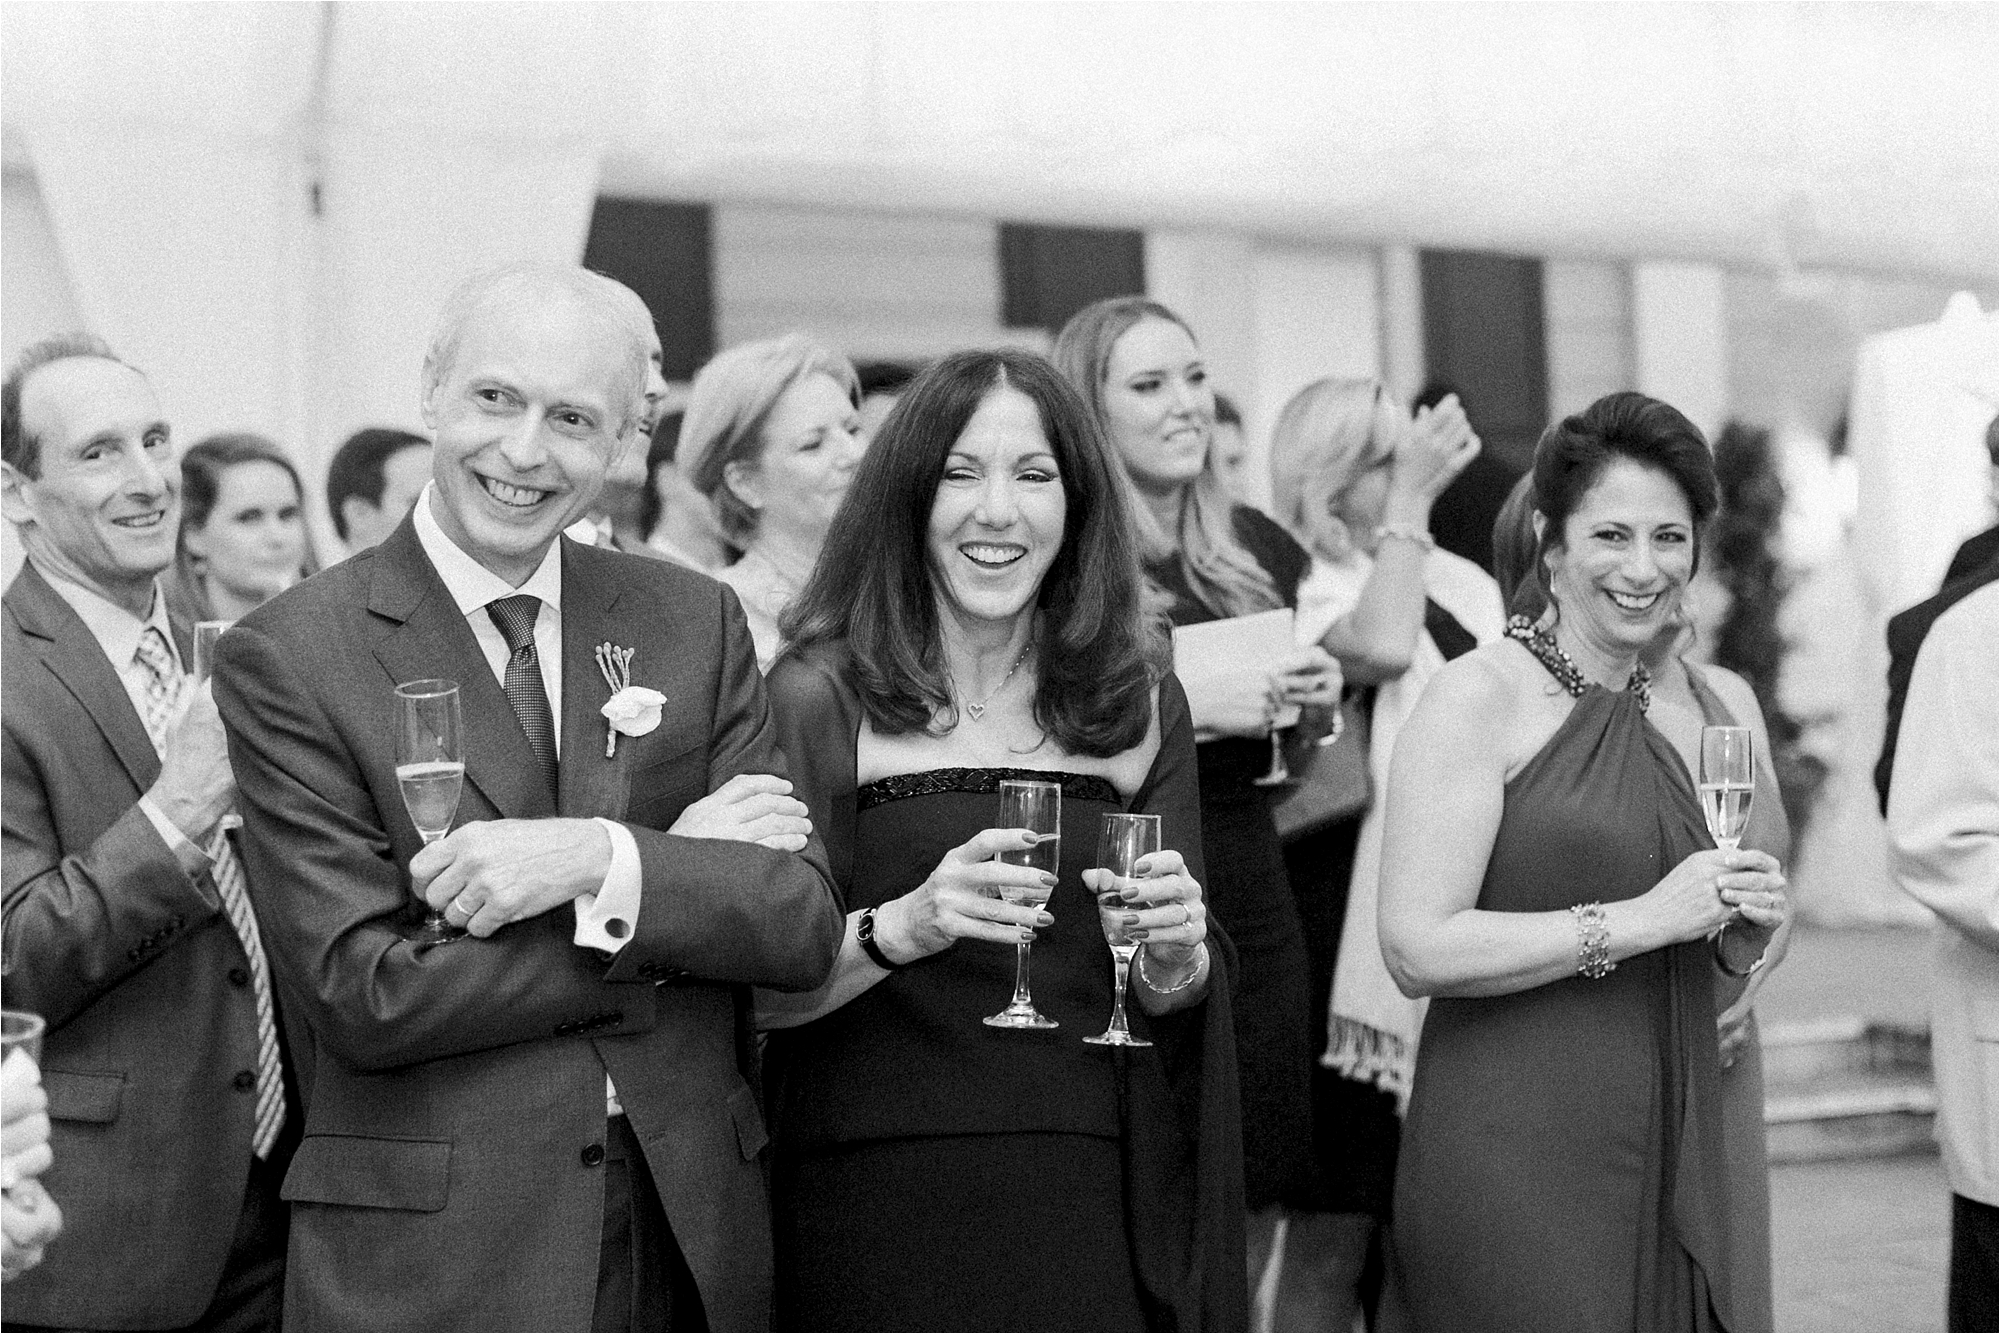 tom-jill-baltimore-maryland-industrial-elegant-wedding-056.JPG